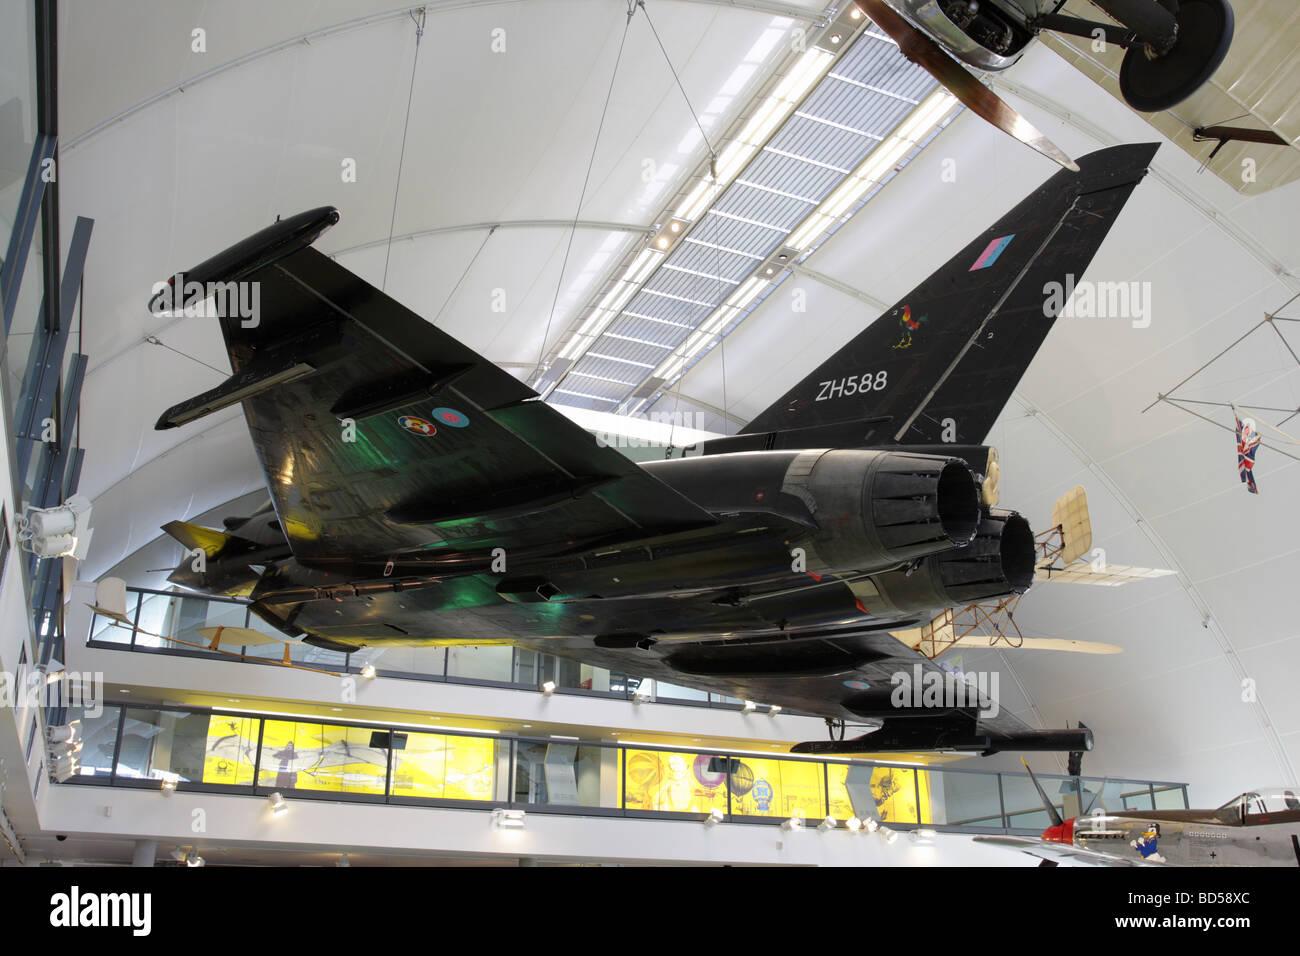 Eurofighter Typhoon prototype currently on display at the Milestones of Flight Exhibition hall at RAF Hendon,London. - Stock Image